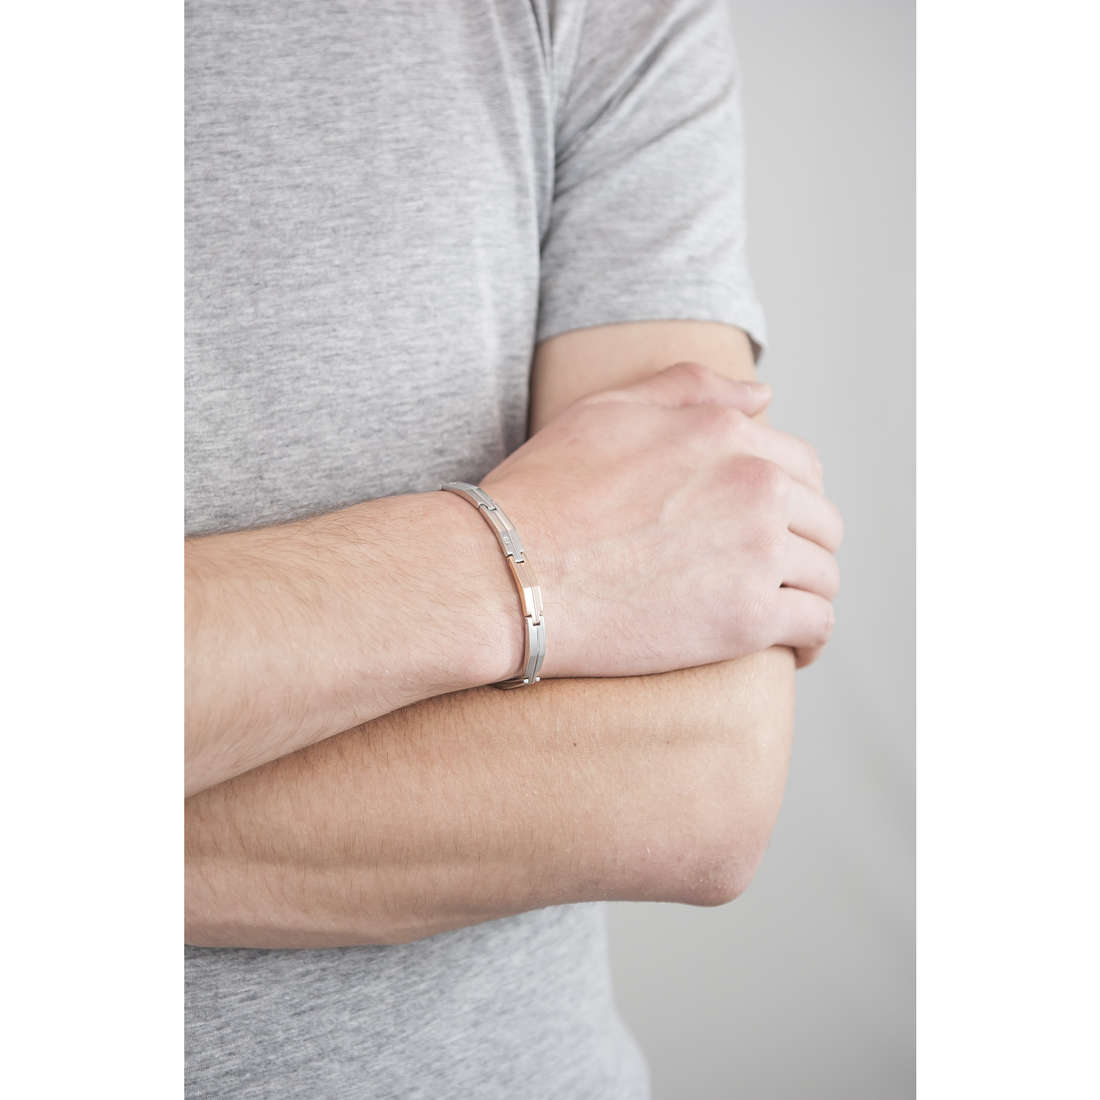 Morellato bracciali Cross uomo SKR02 indosso